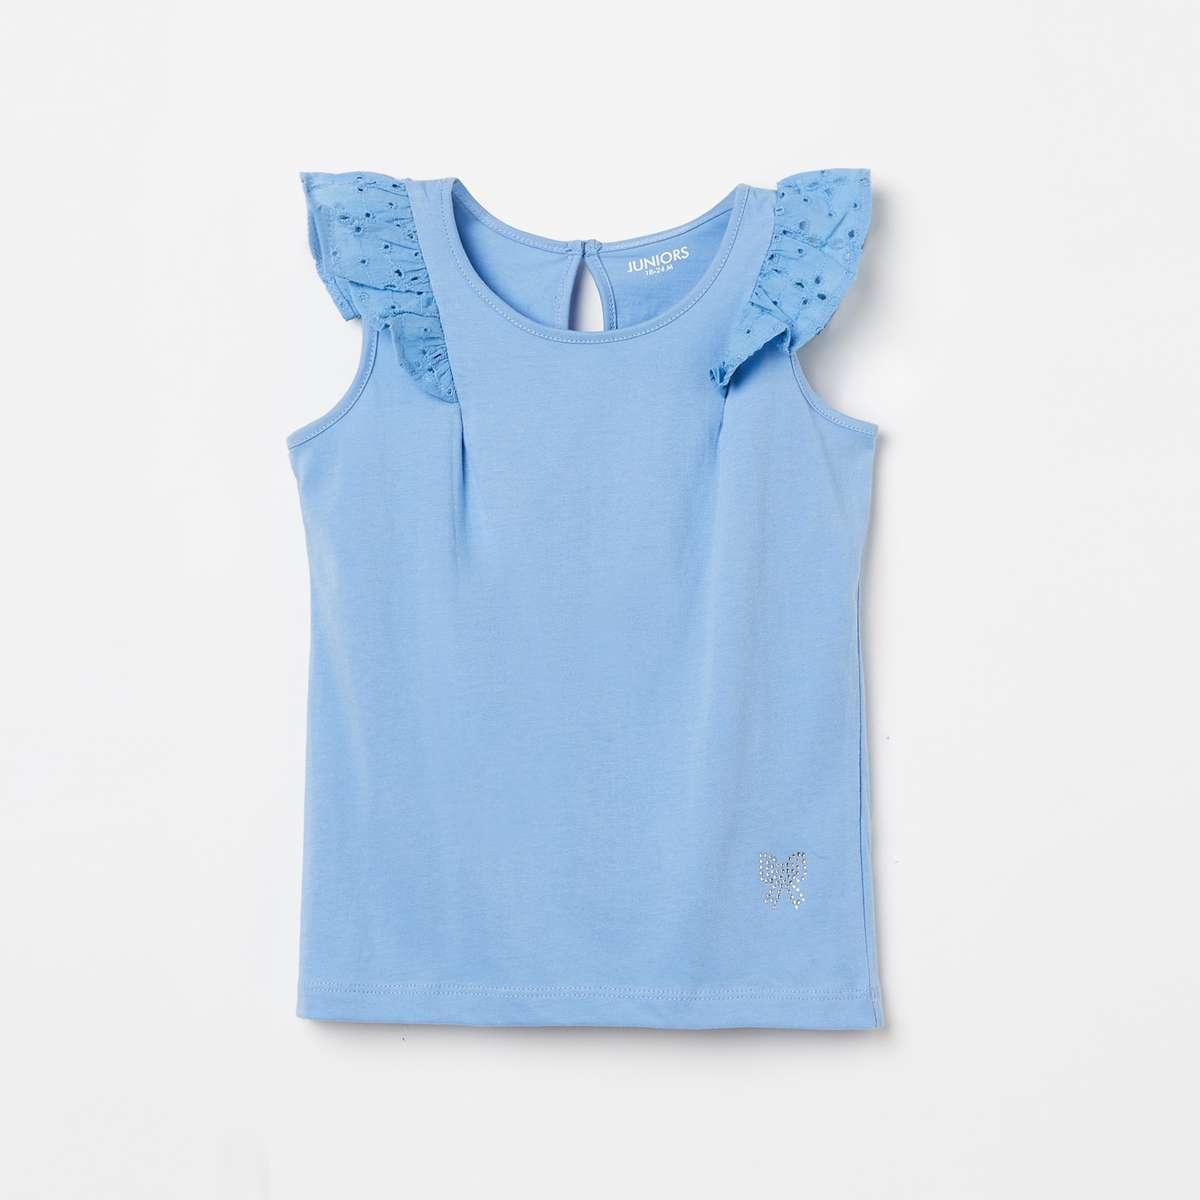 5.JUNIORS Girls Schiffli Embroidery Sleeveless Top